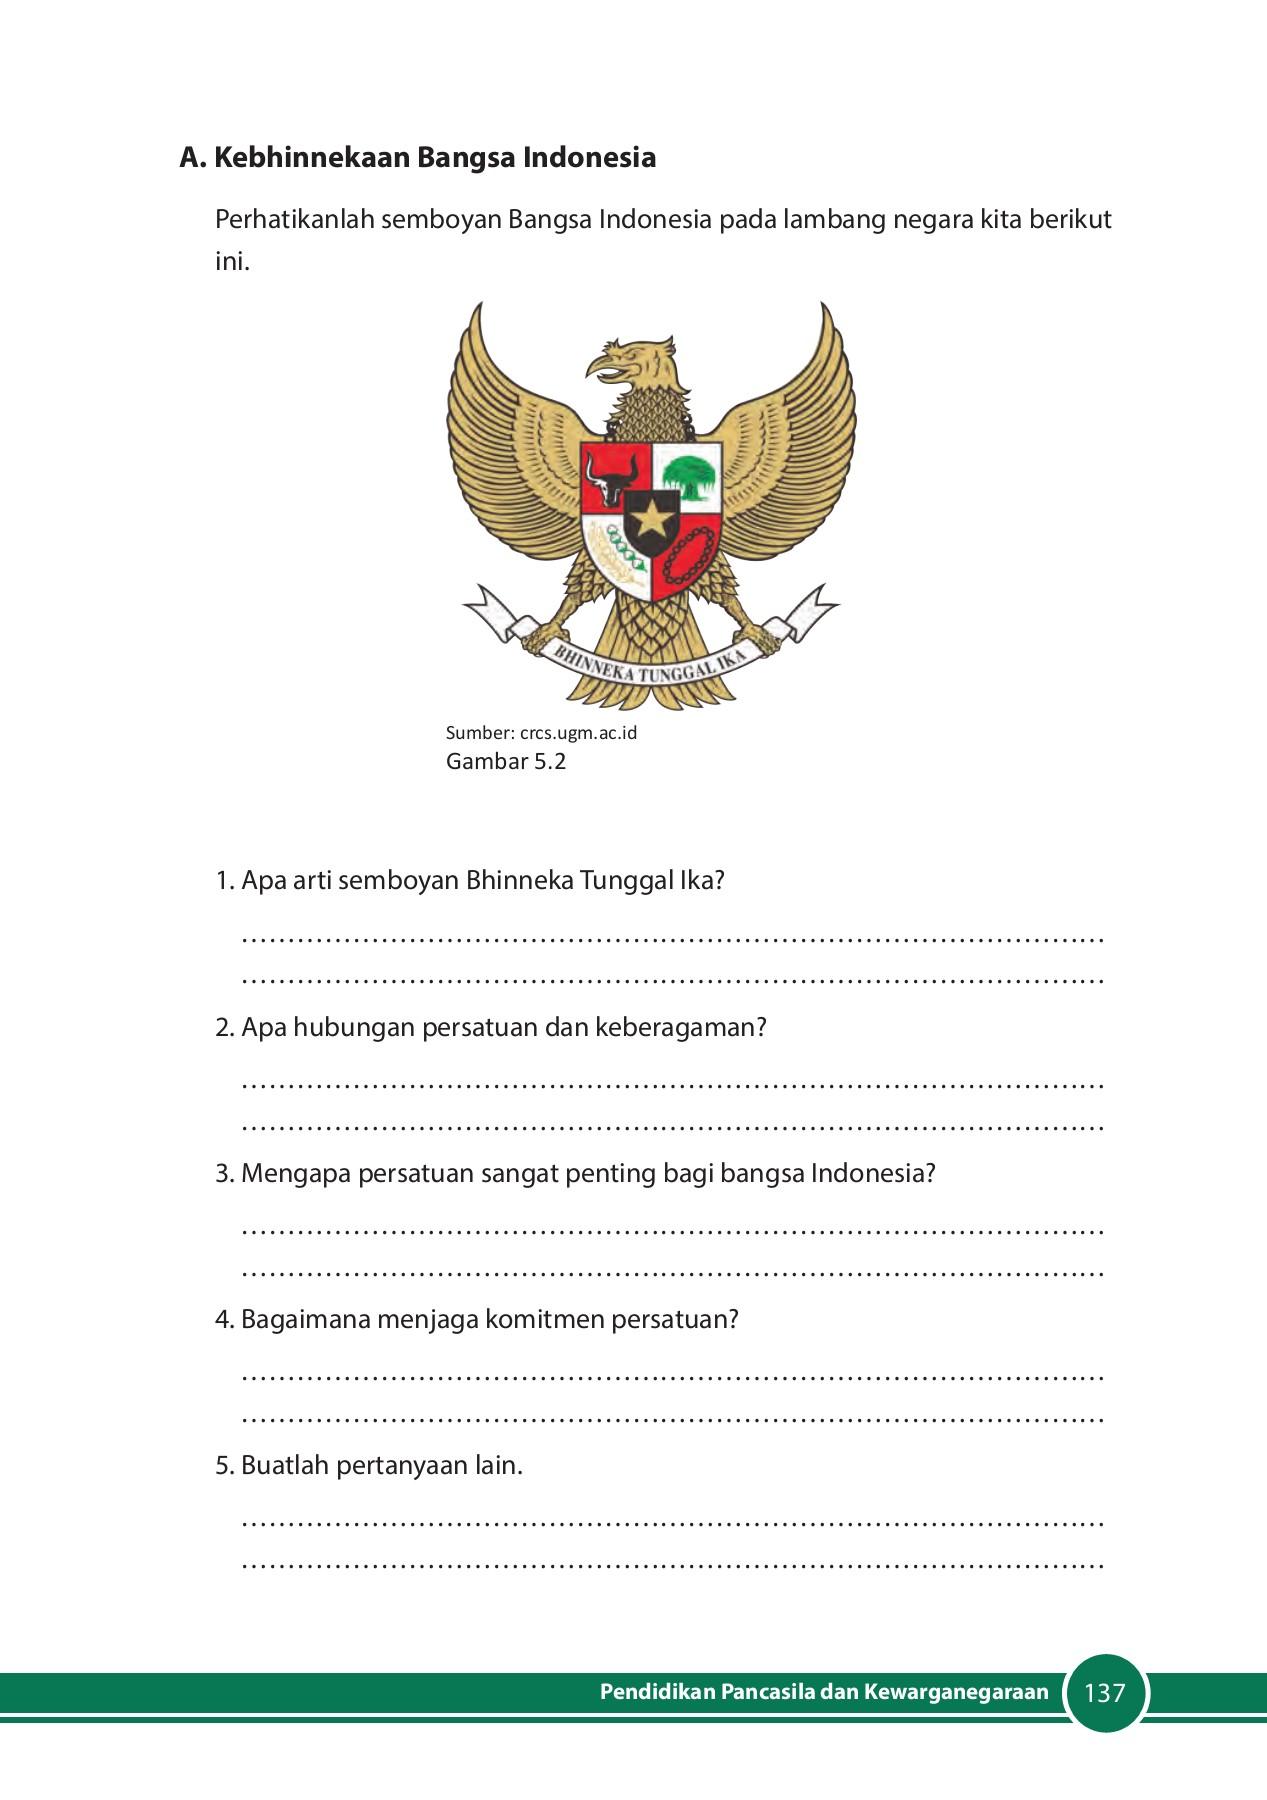 Bagaimana Menjaga Komitmen Persatuan : bagaimana, menjaga, komitmen, persatuan, Bagaimana, Menjaga, Komitmen, Persatuan, Buatlah, Pertanyaan, IlmuSosial.id